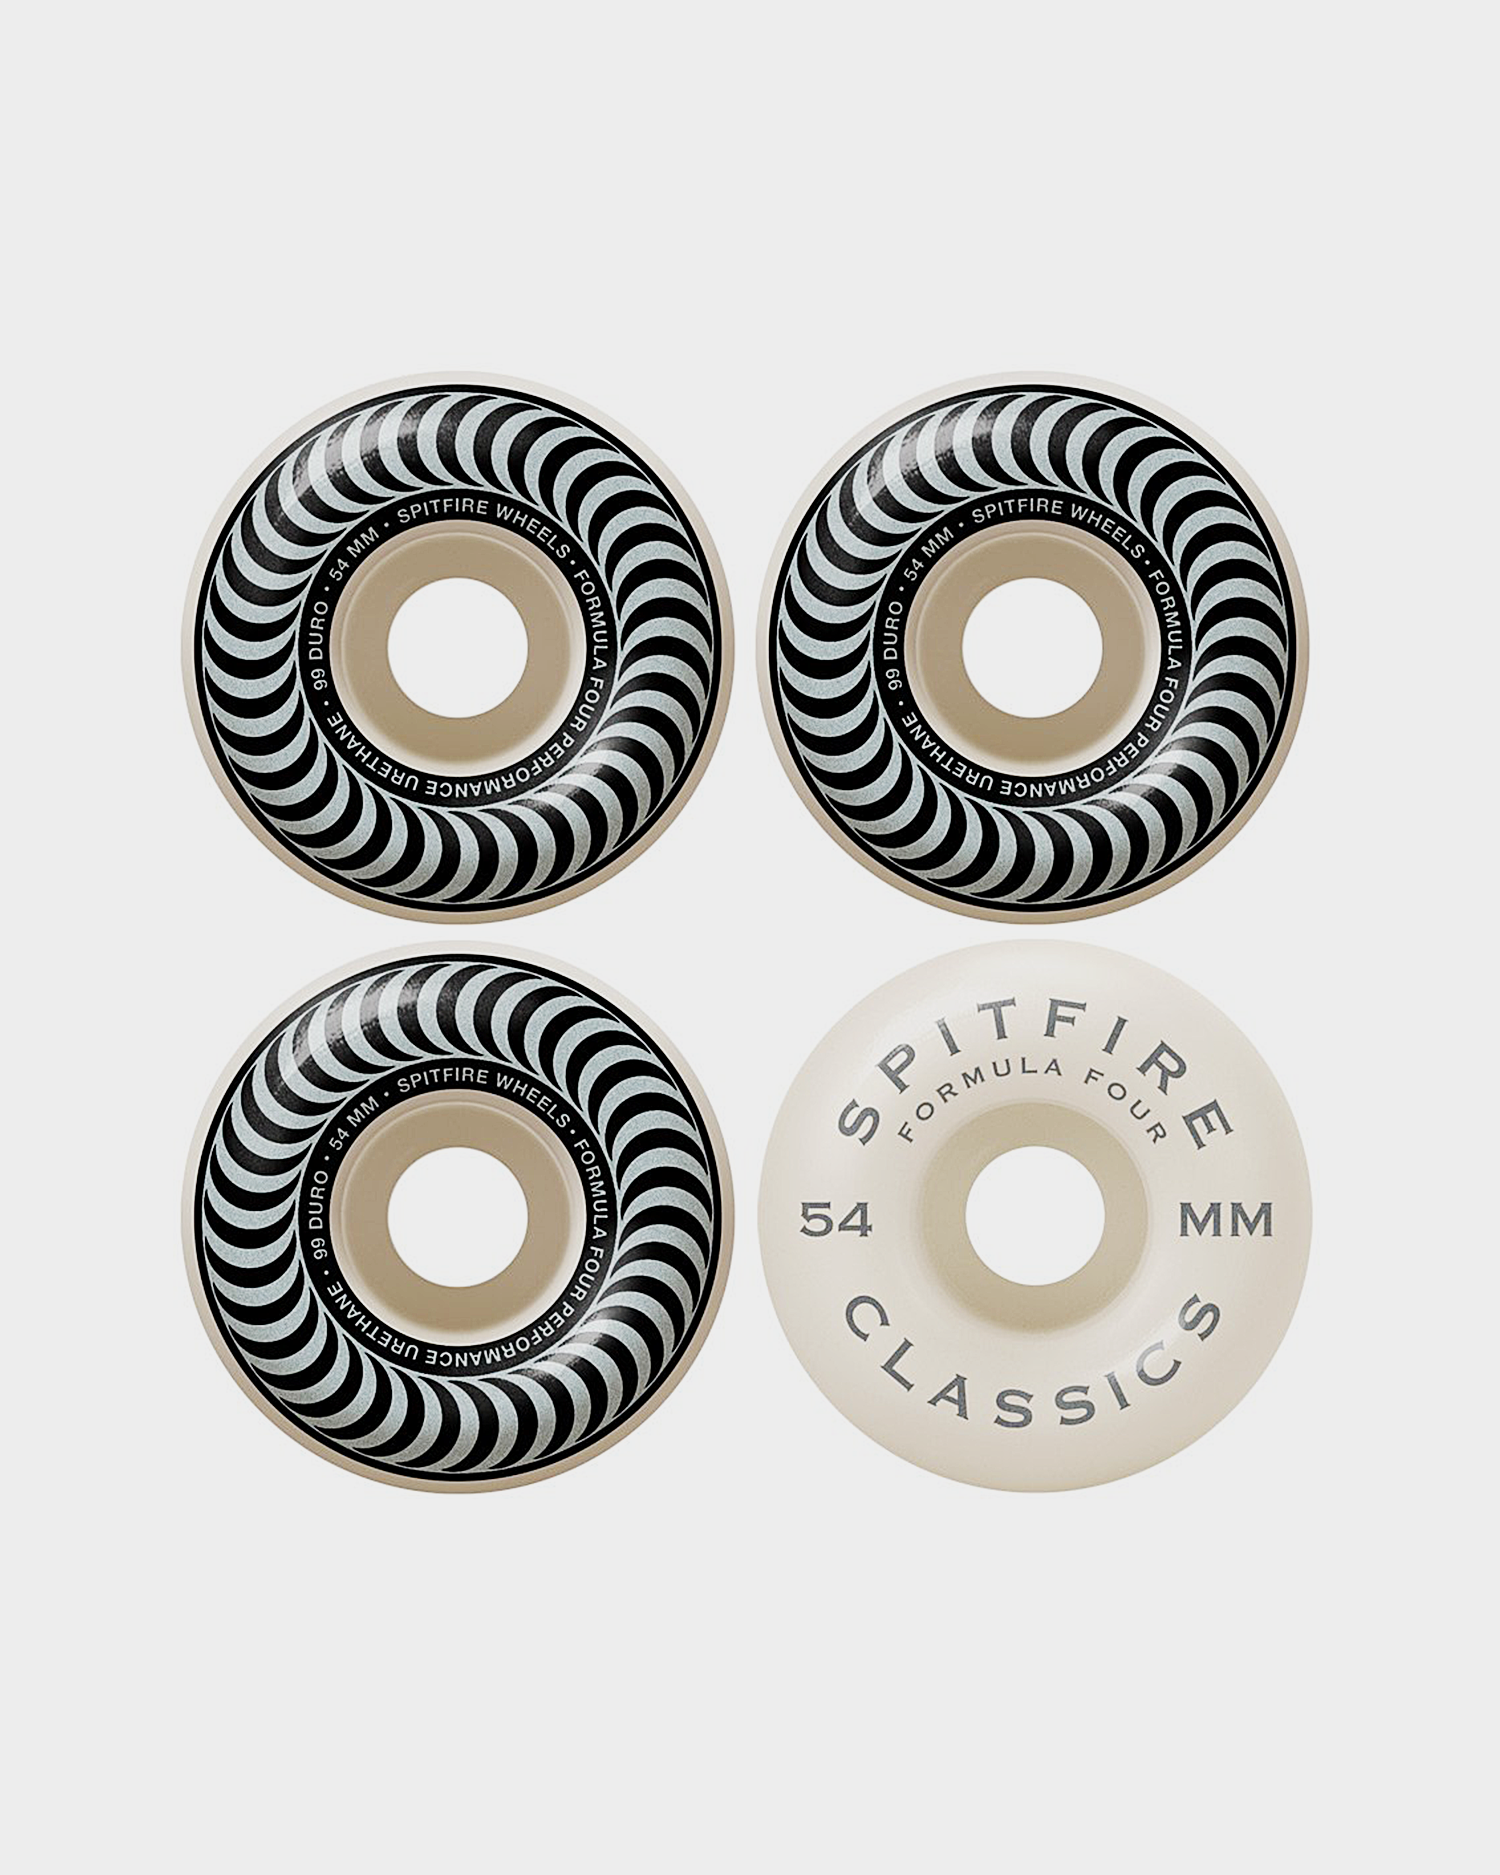 Spitfire Wheels F4 99 Classic Silver 54mm